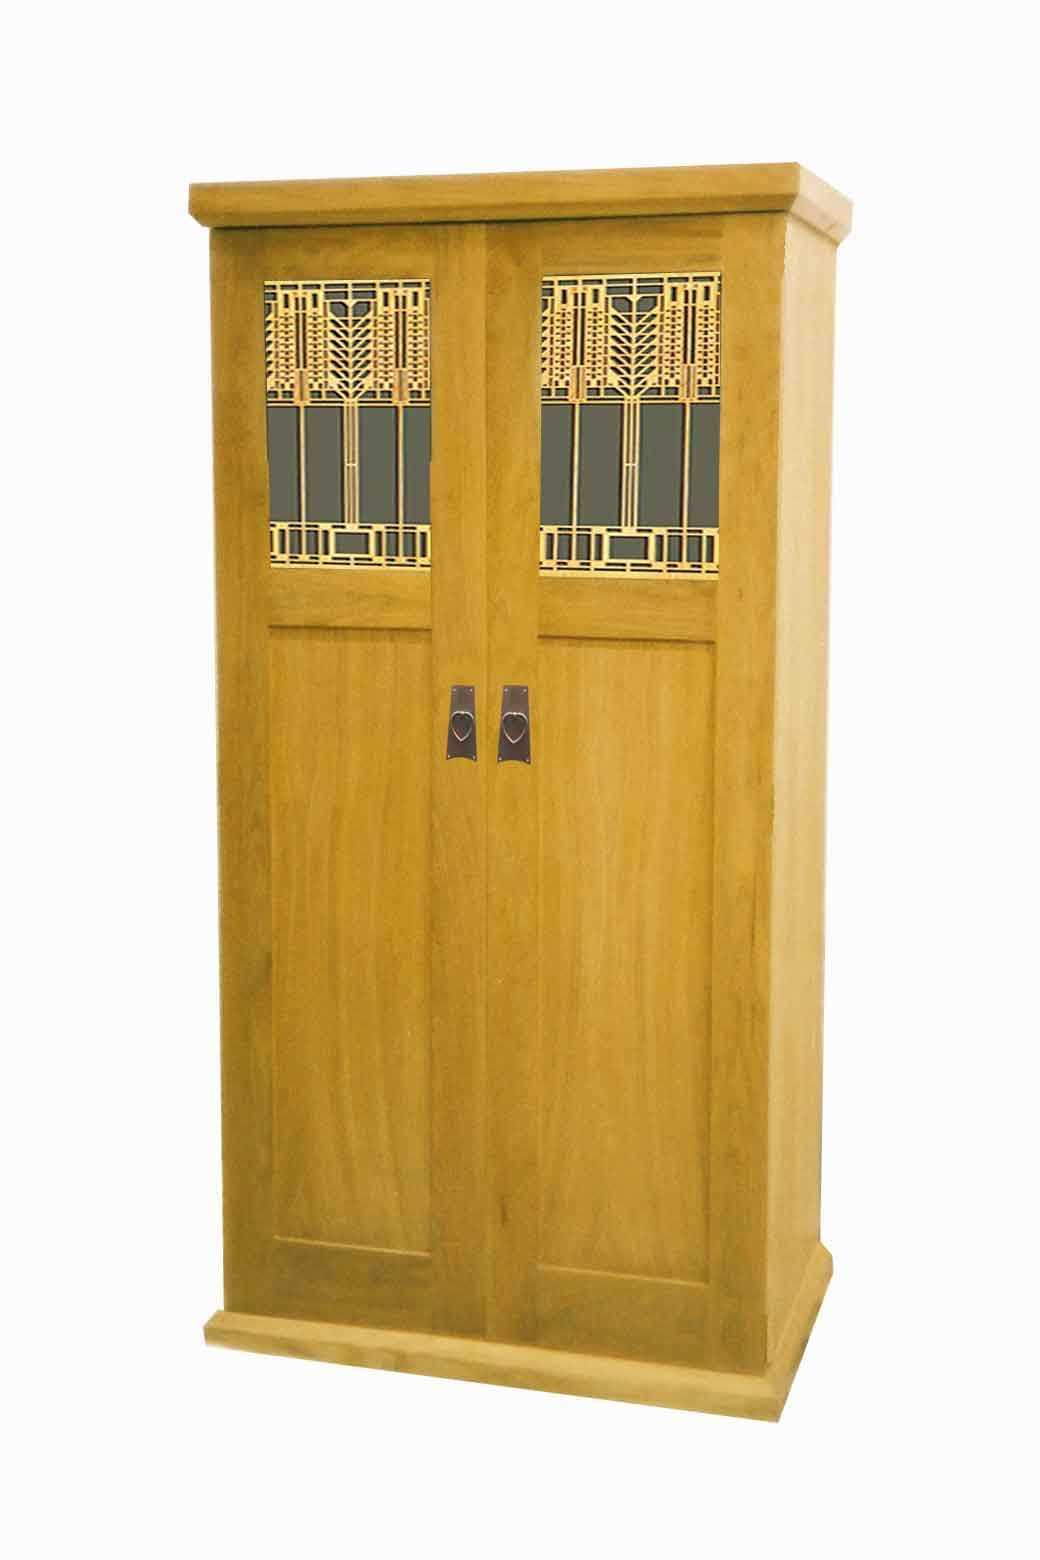 Frank Lloyd Wright Prairie Mission Style Arts Crafts Movement Oak Bedroom Wardrobe With Decorative Fretwork